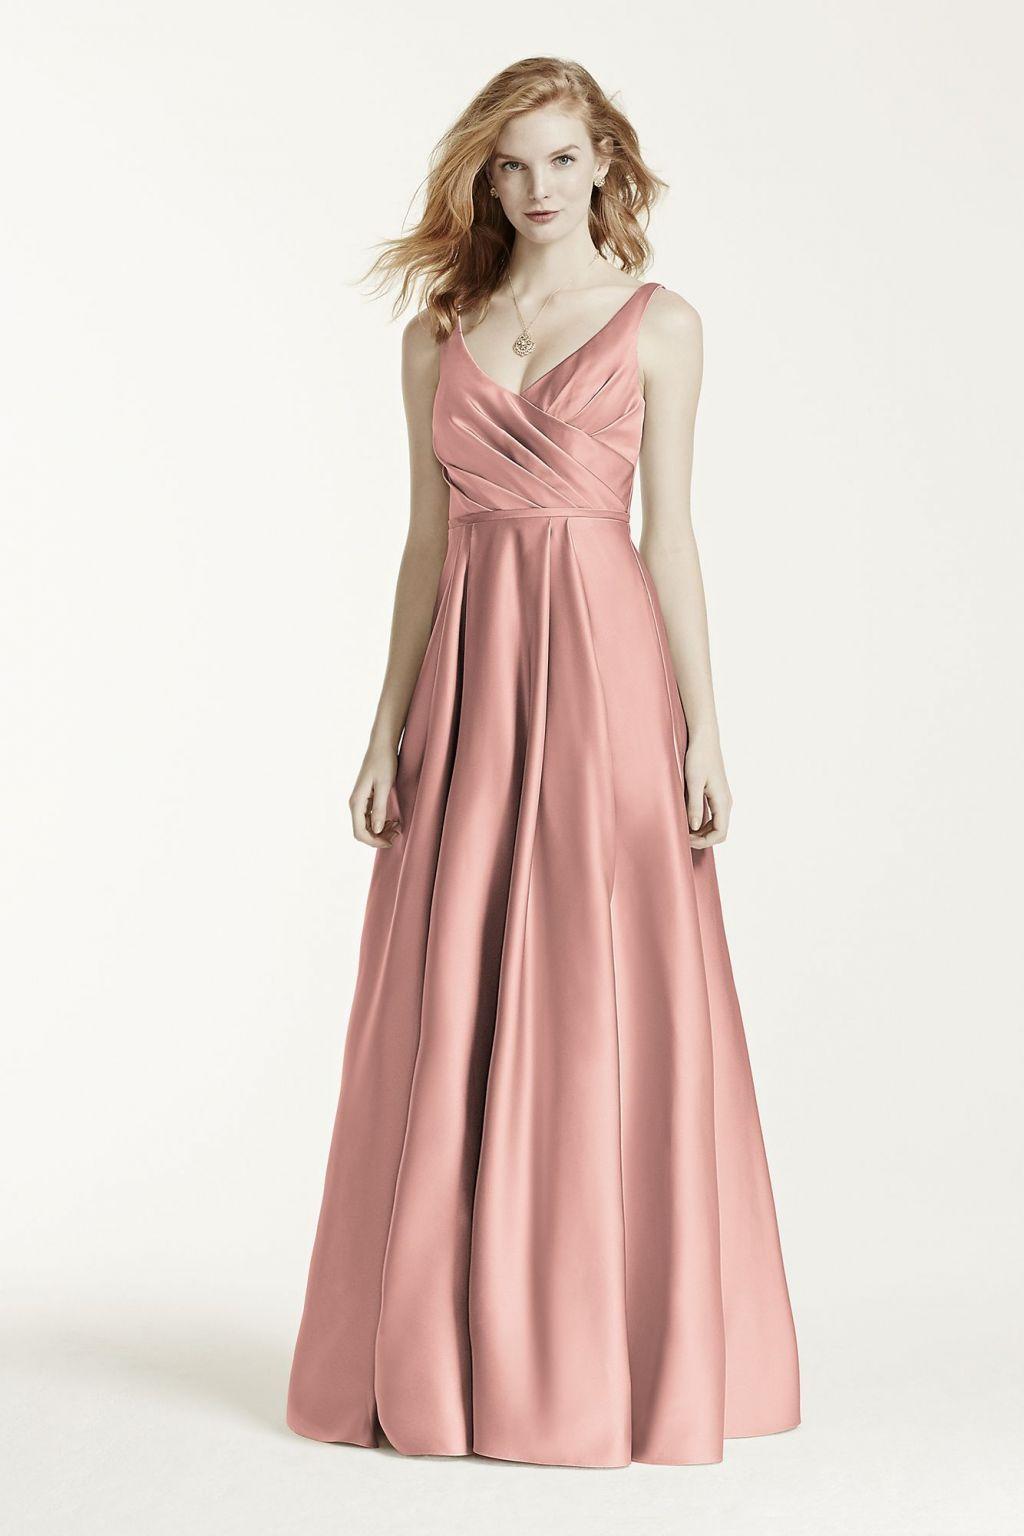 472d4e682344 David's Bridal Long Satin Tank Ball Gown / F15741, Size: 6 ...